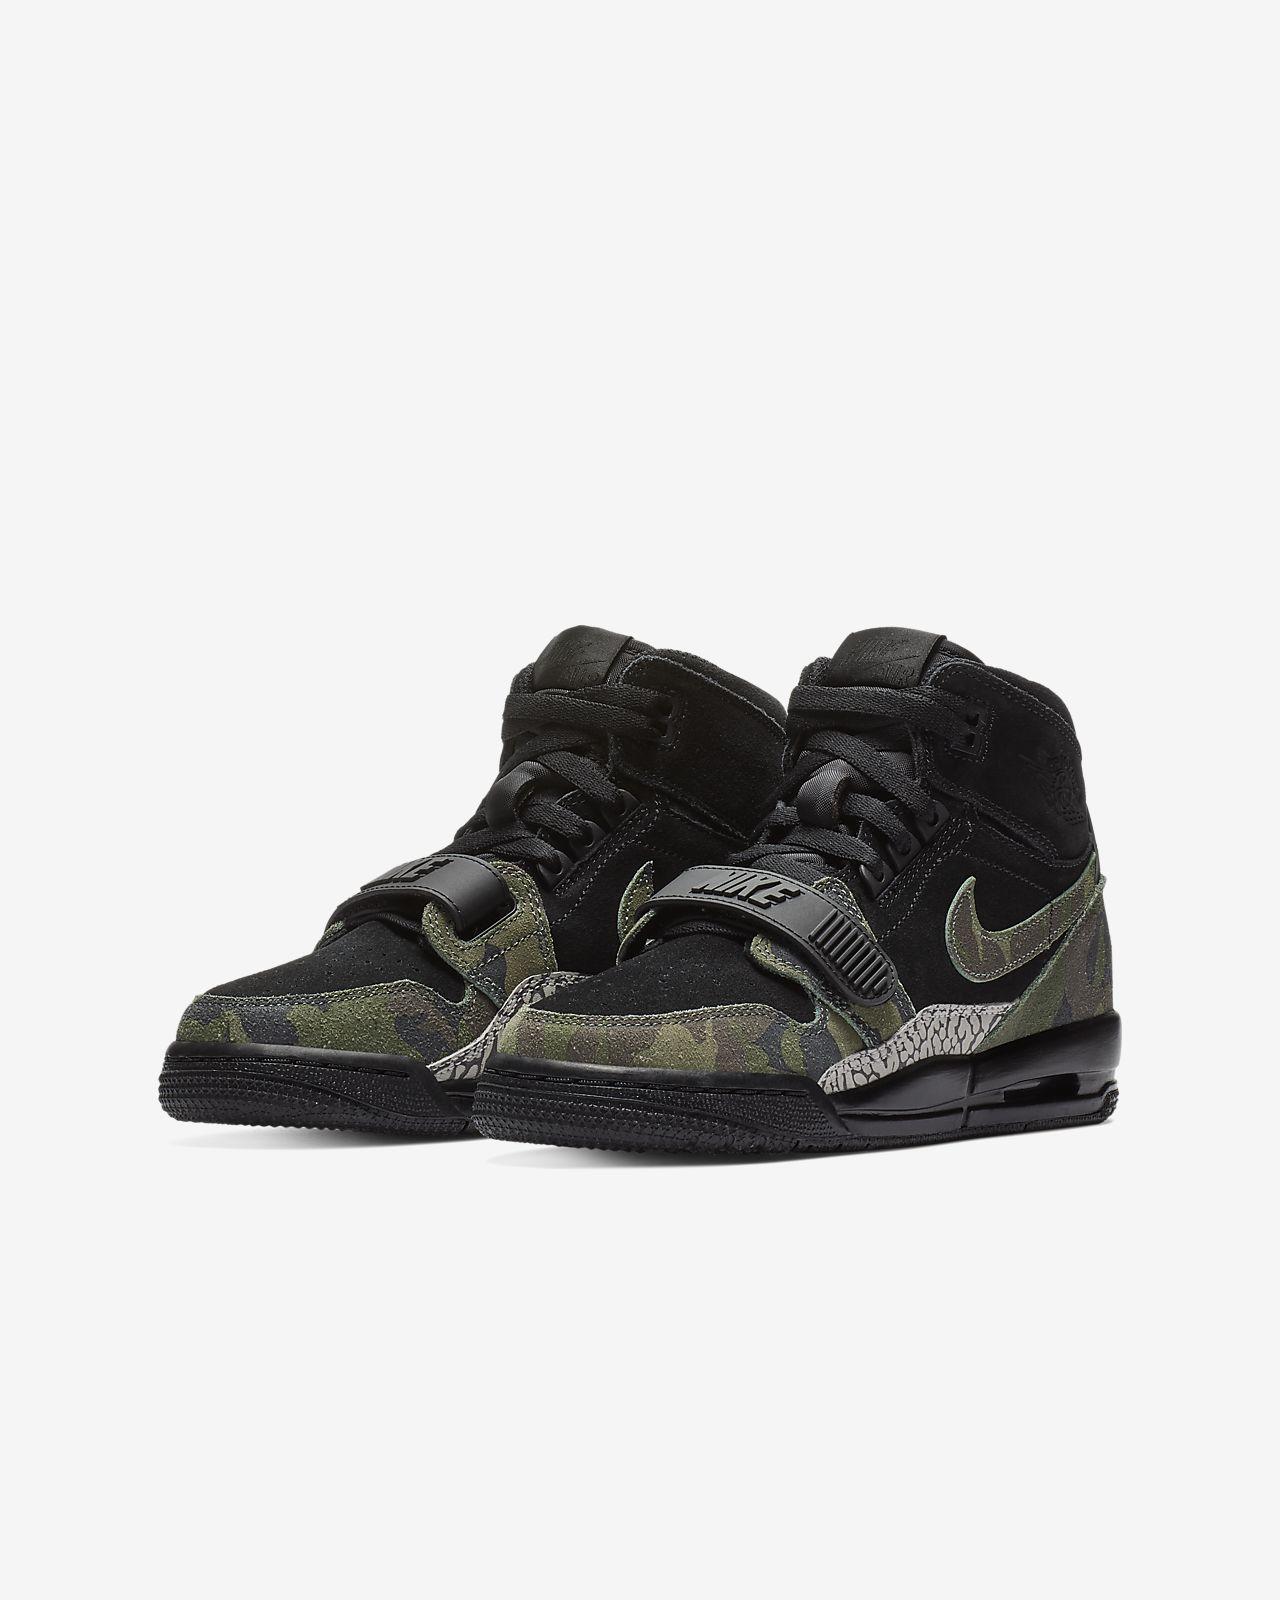 reputable site ffdf8 ab334 ... Air Jordan Legacy 312 Big Kids  Shoe